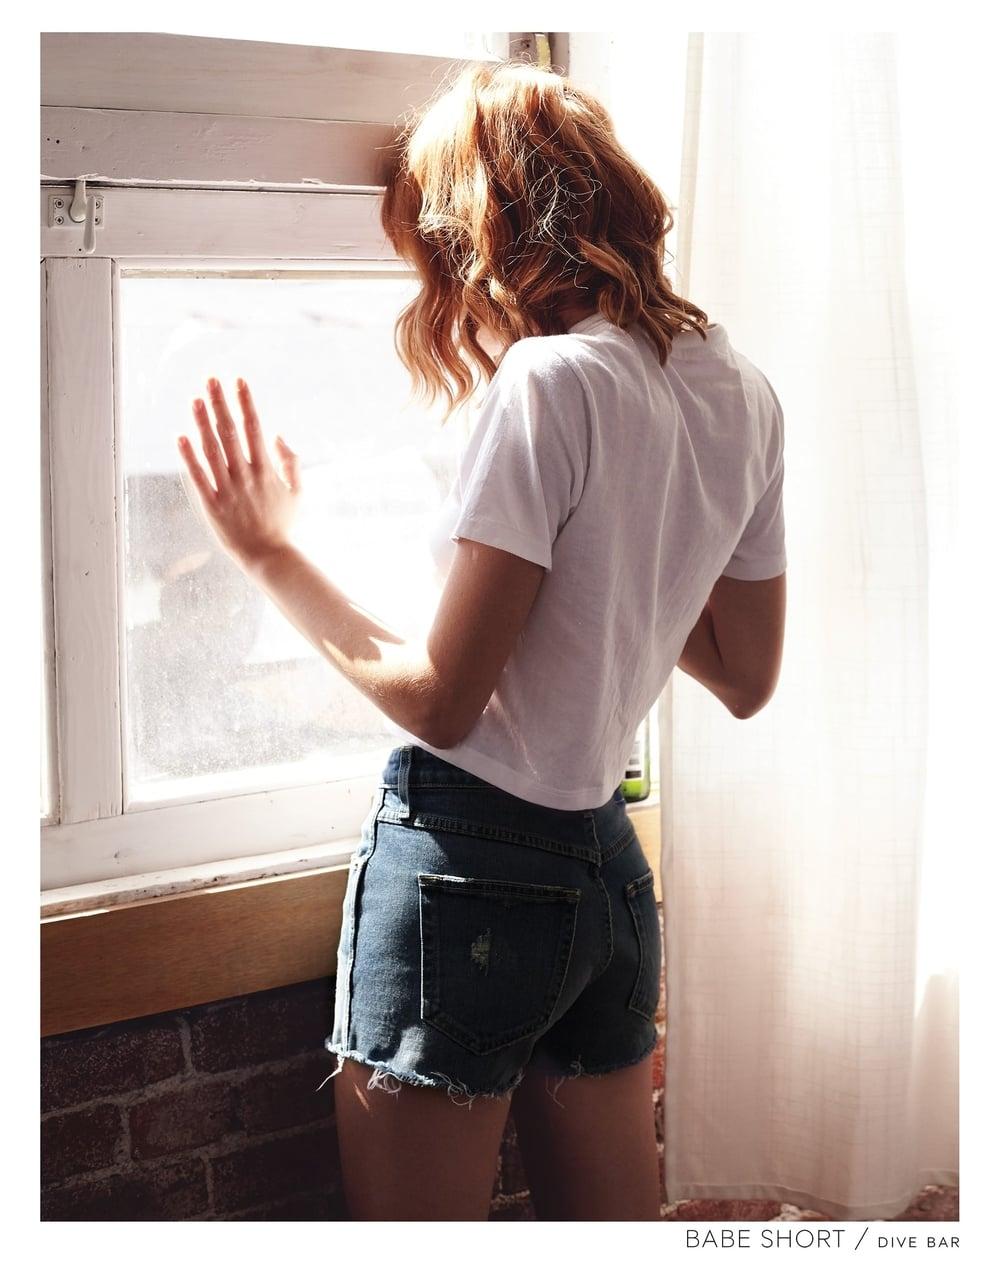 20_BABE-SHORT-WINDOW.jpg